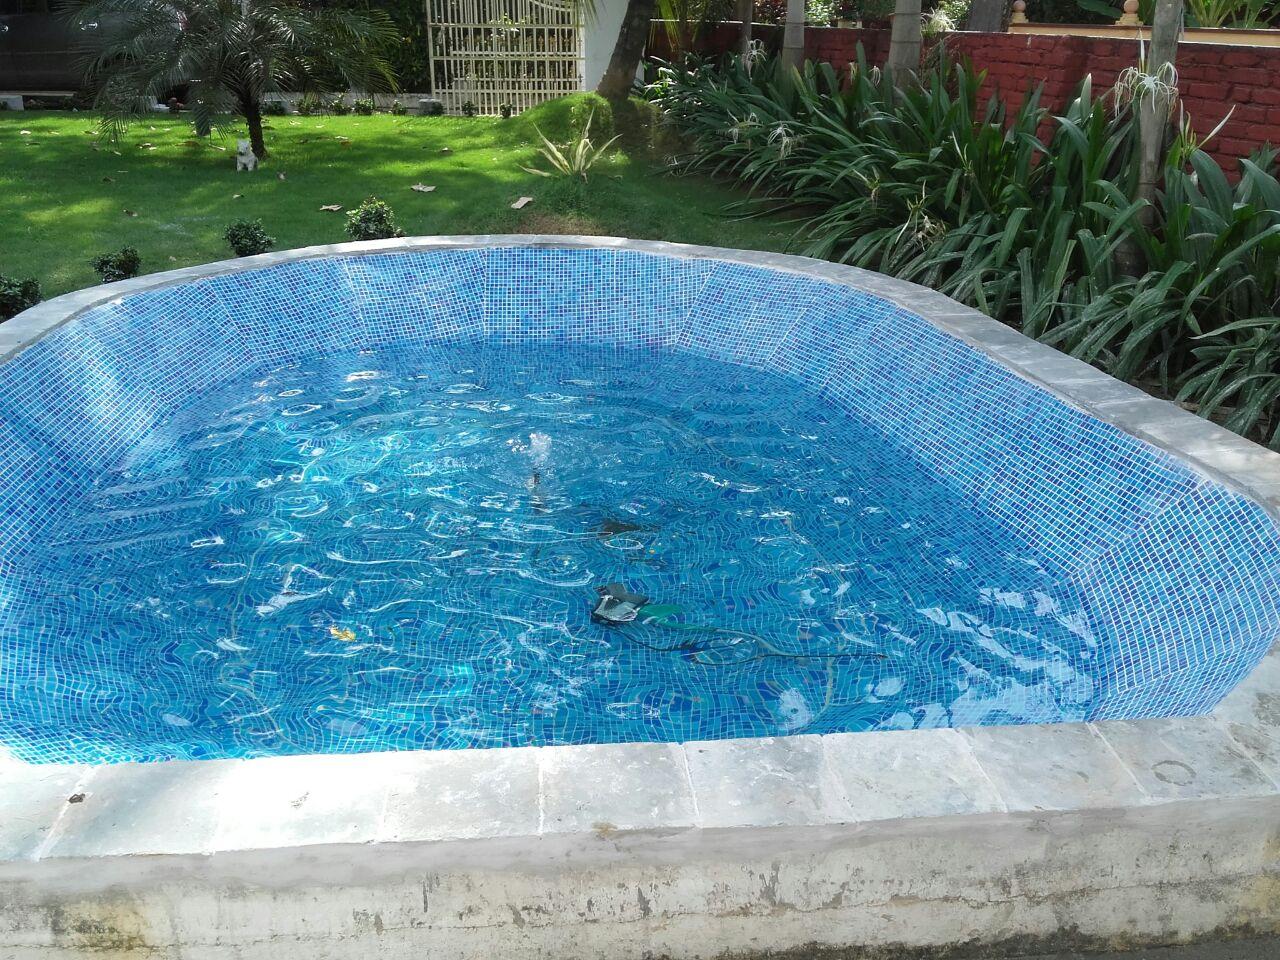 Koi fish pond renovation nedumbassery kochi for Starting a koi pond